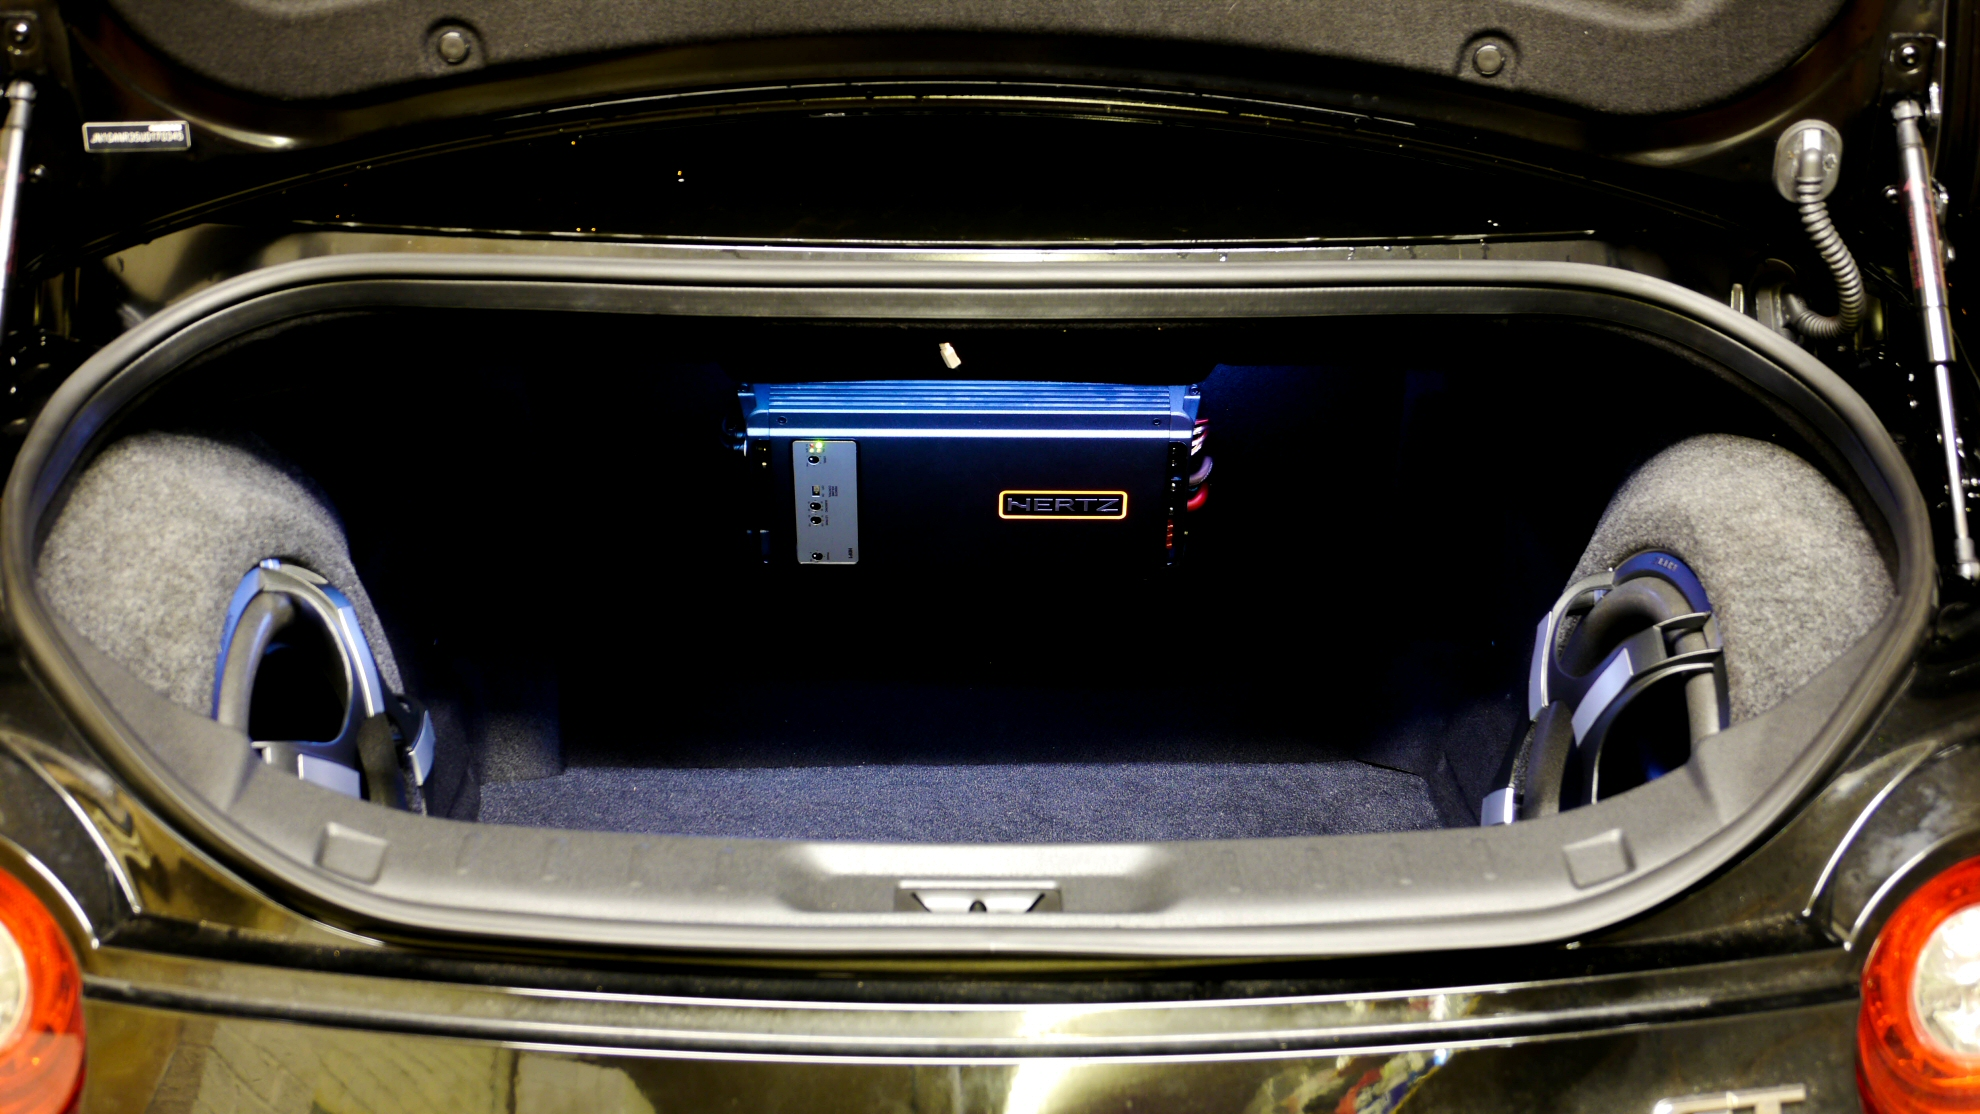 Nissan R35 Gtr Audio System Upgrade Stage 2